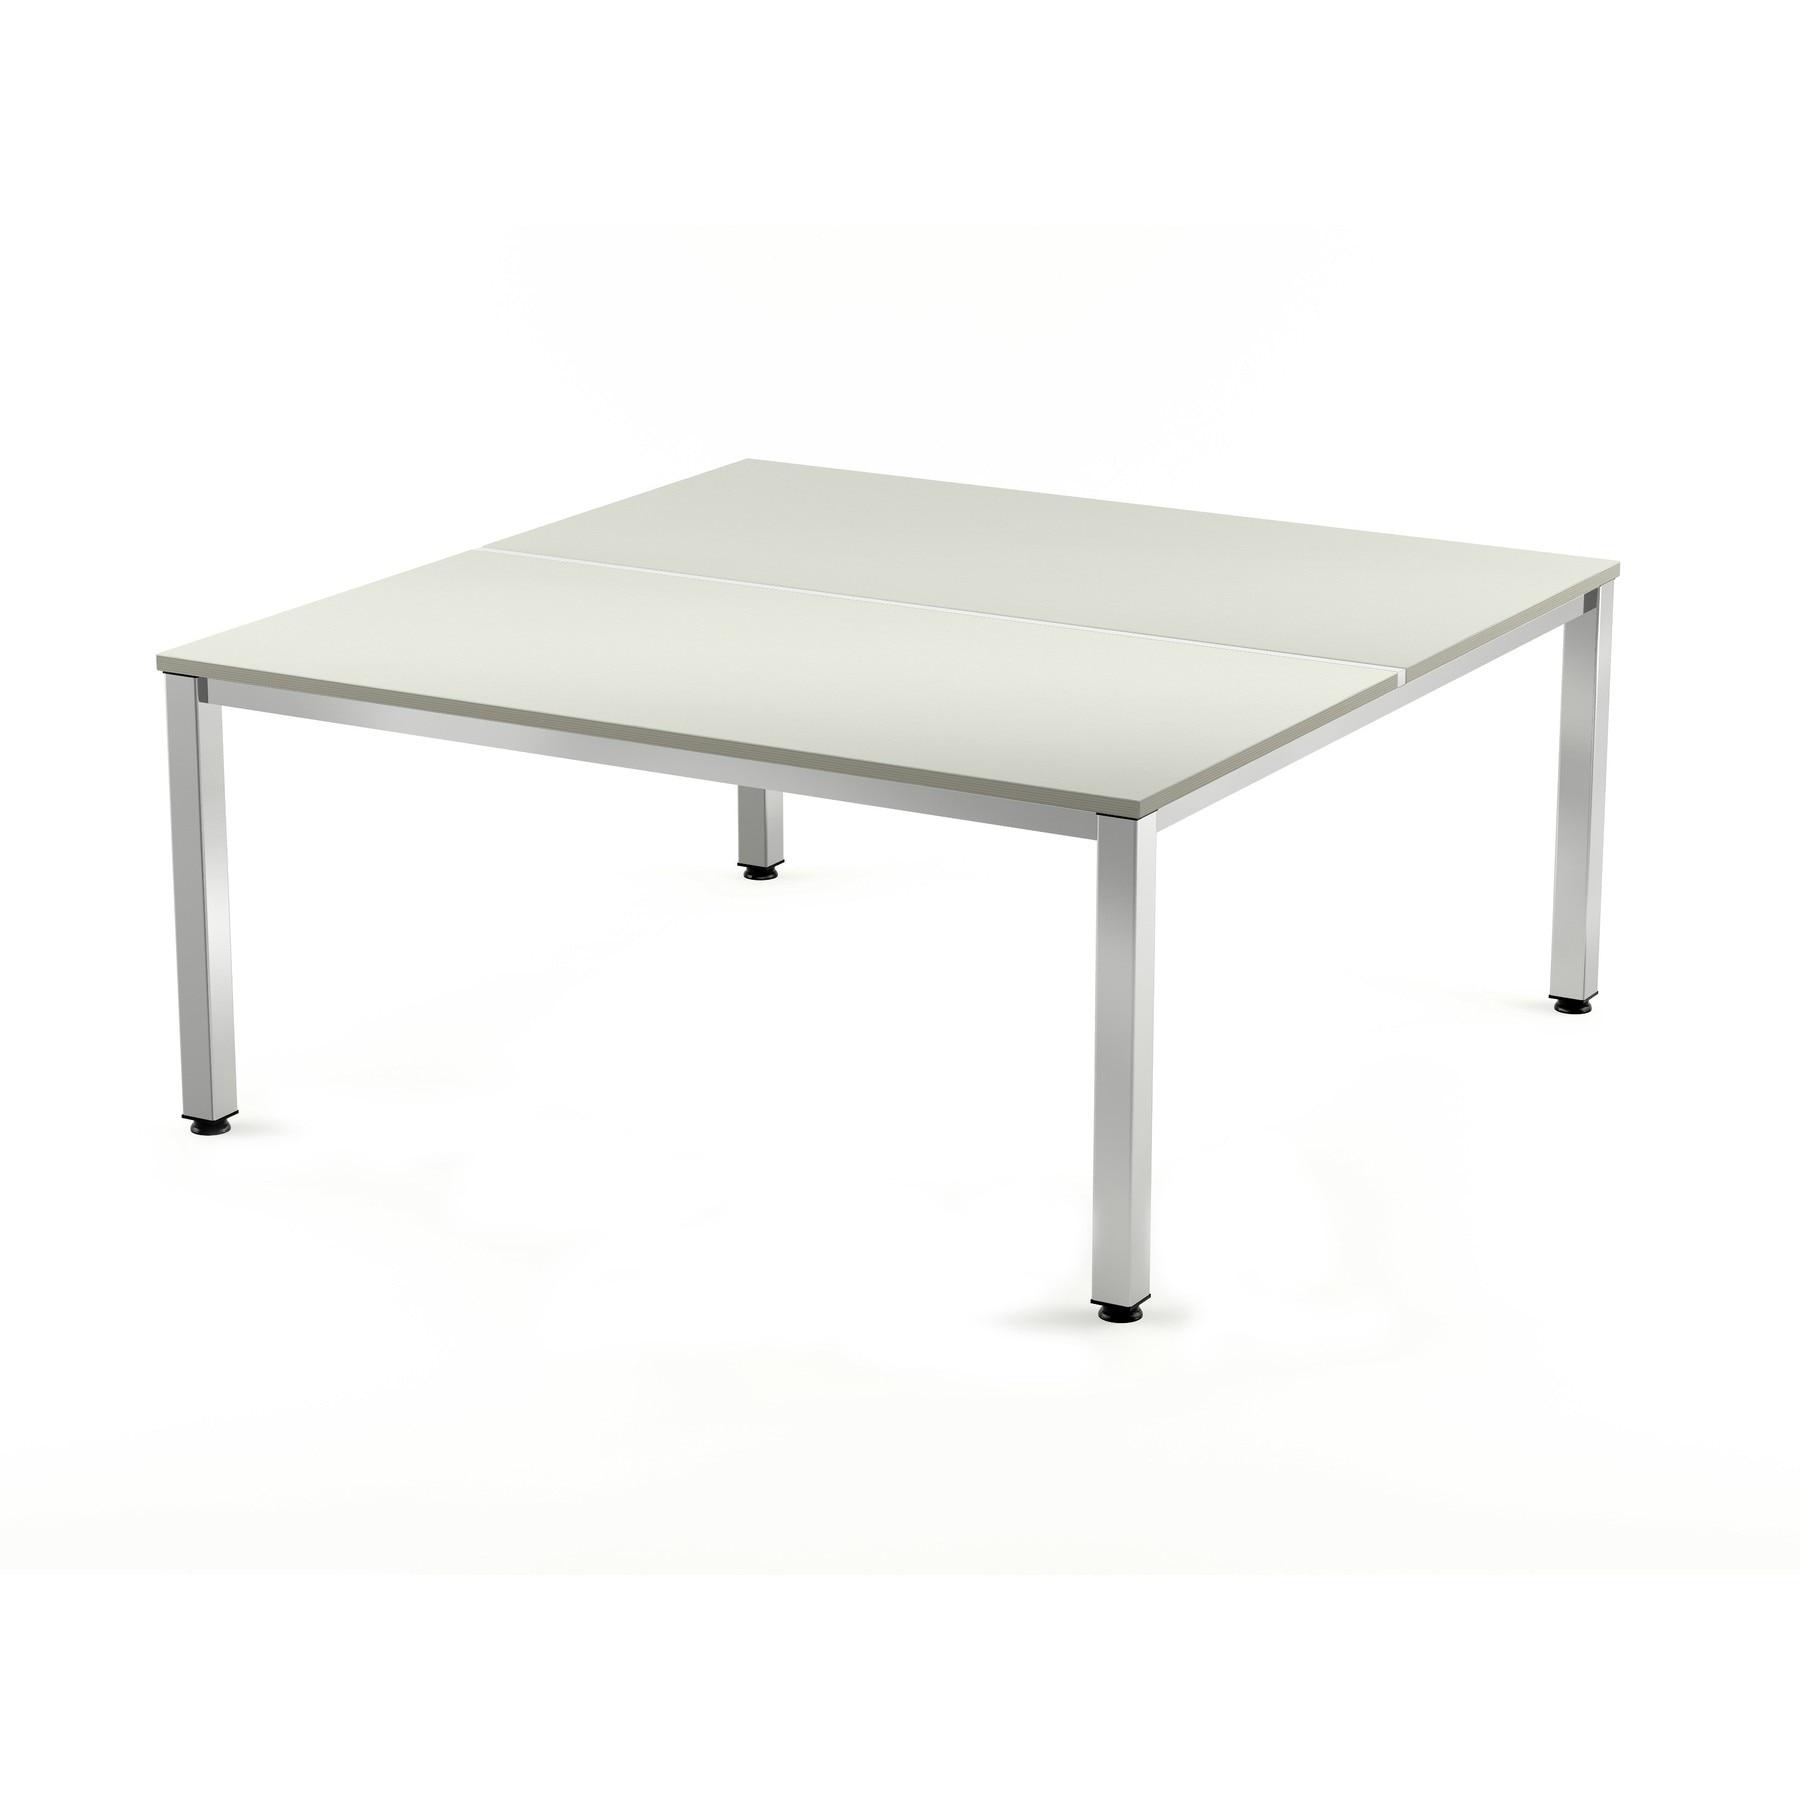 TABLE DE OFFICE DOUBLE EXECUTIVE SERIES 180X163 CHROME/GREY